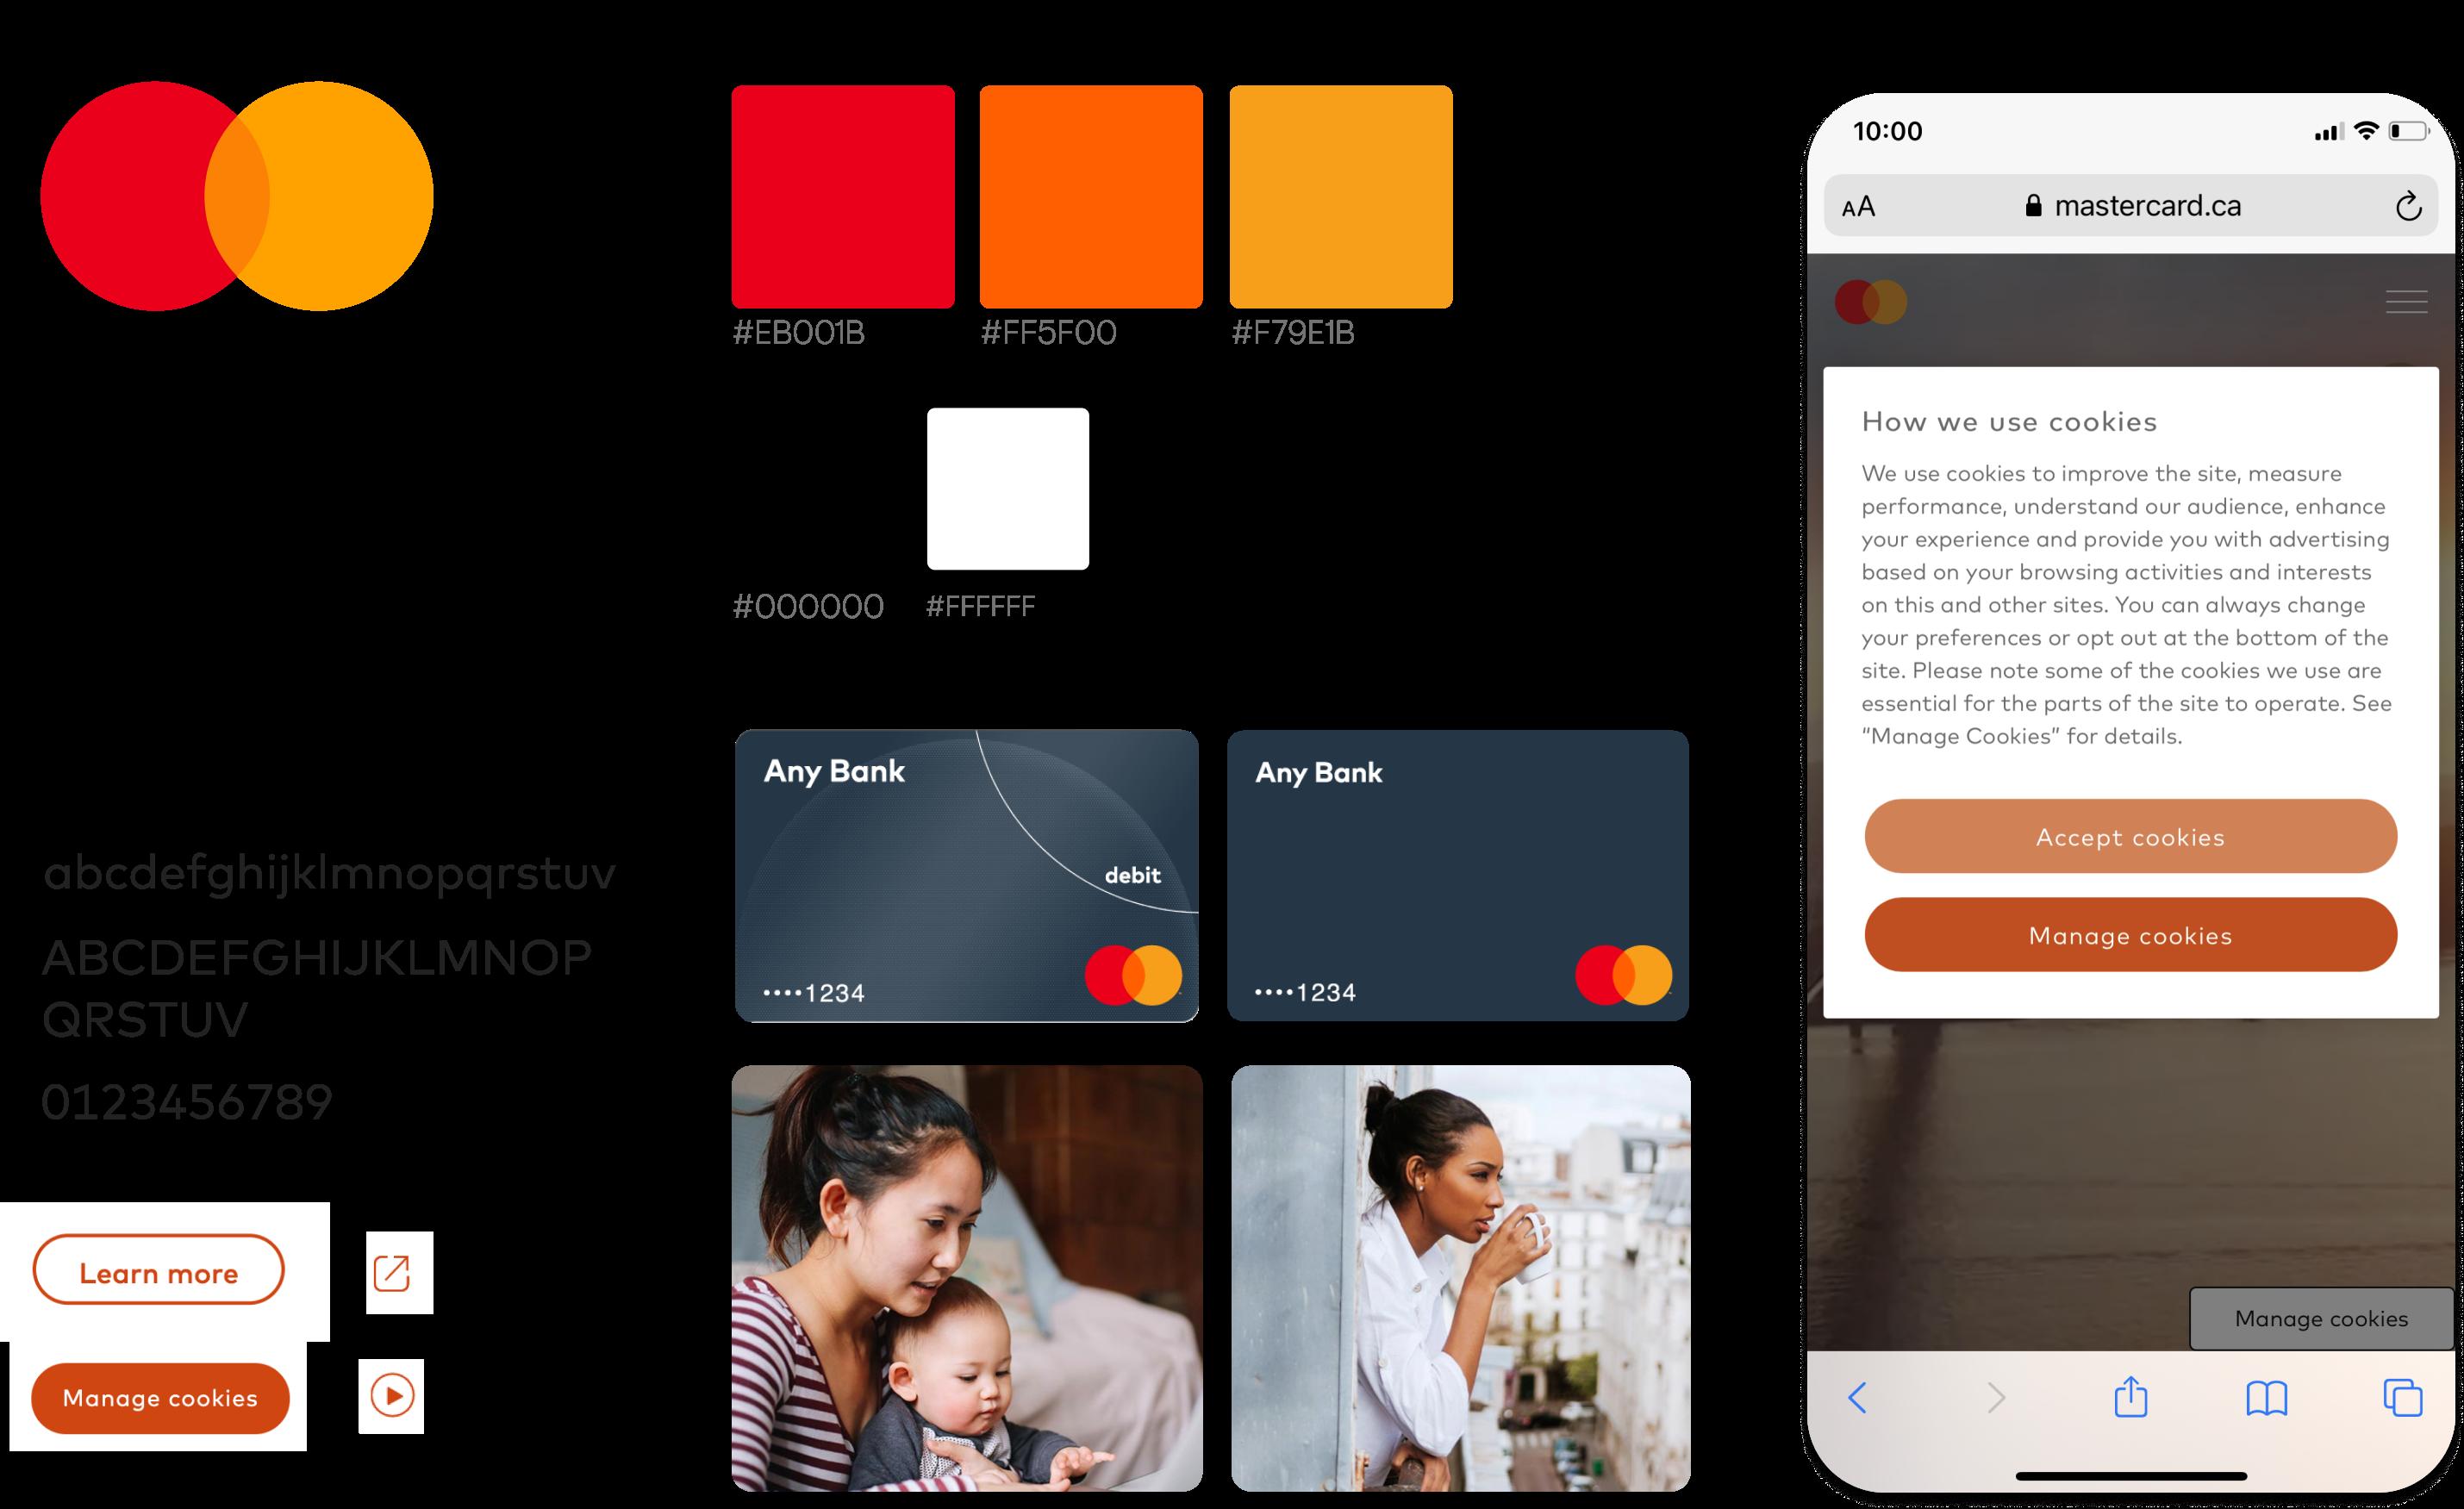 Mastercard's branding assets